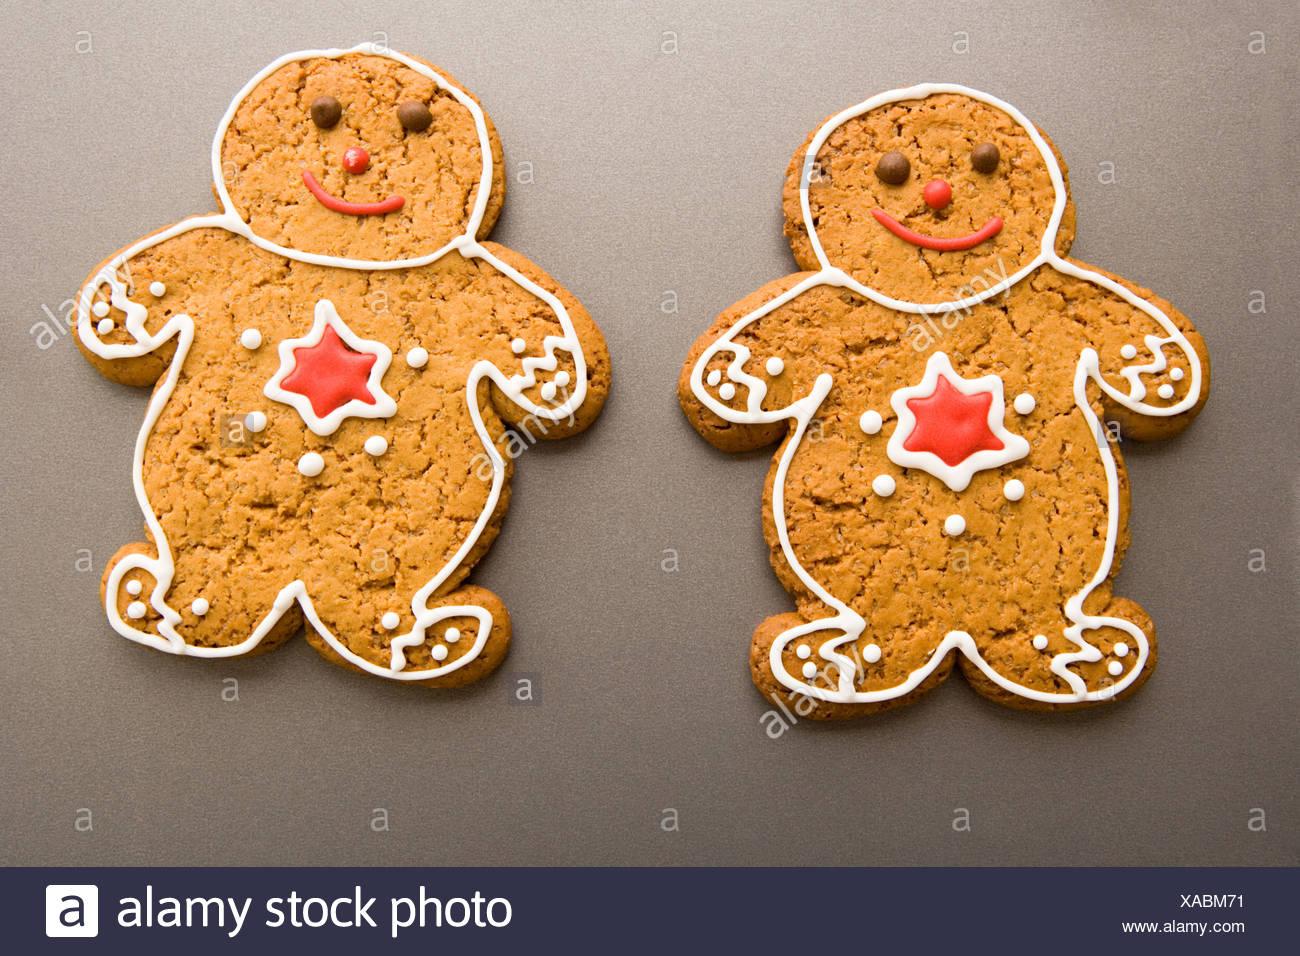 gingerbread lives stock photos gingerbread lives stock images alamy. Black Bedroom Furniture Sets. Home Design Ideas